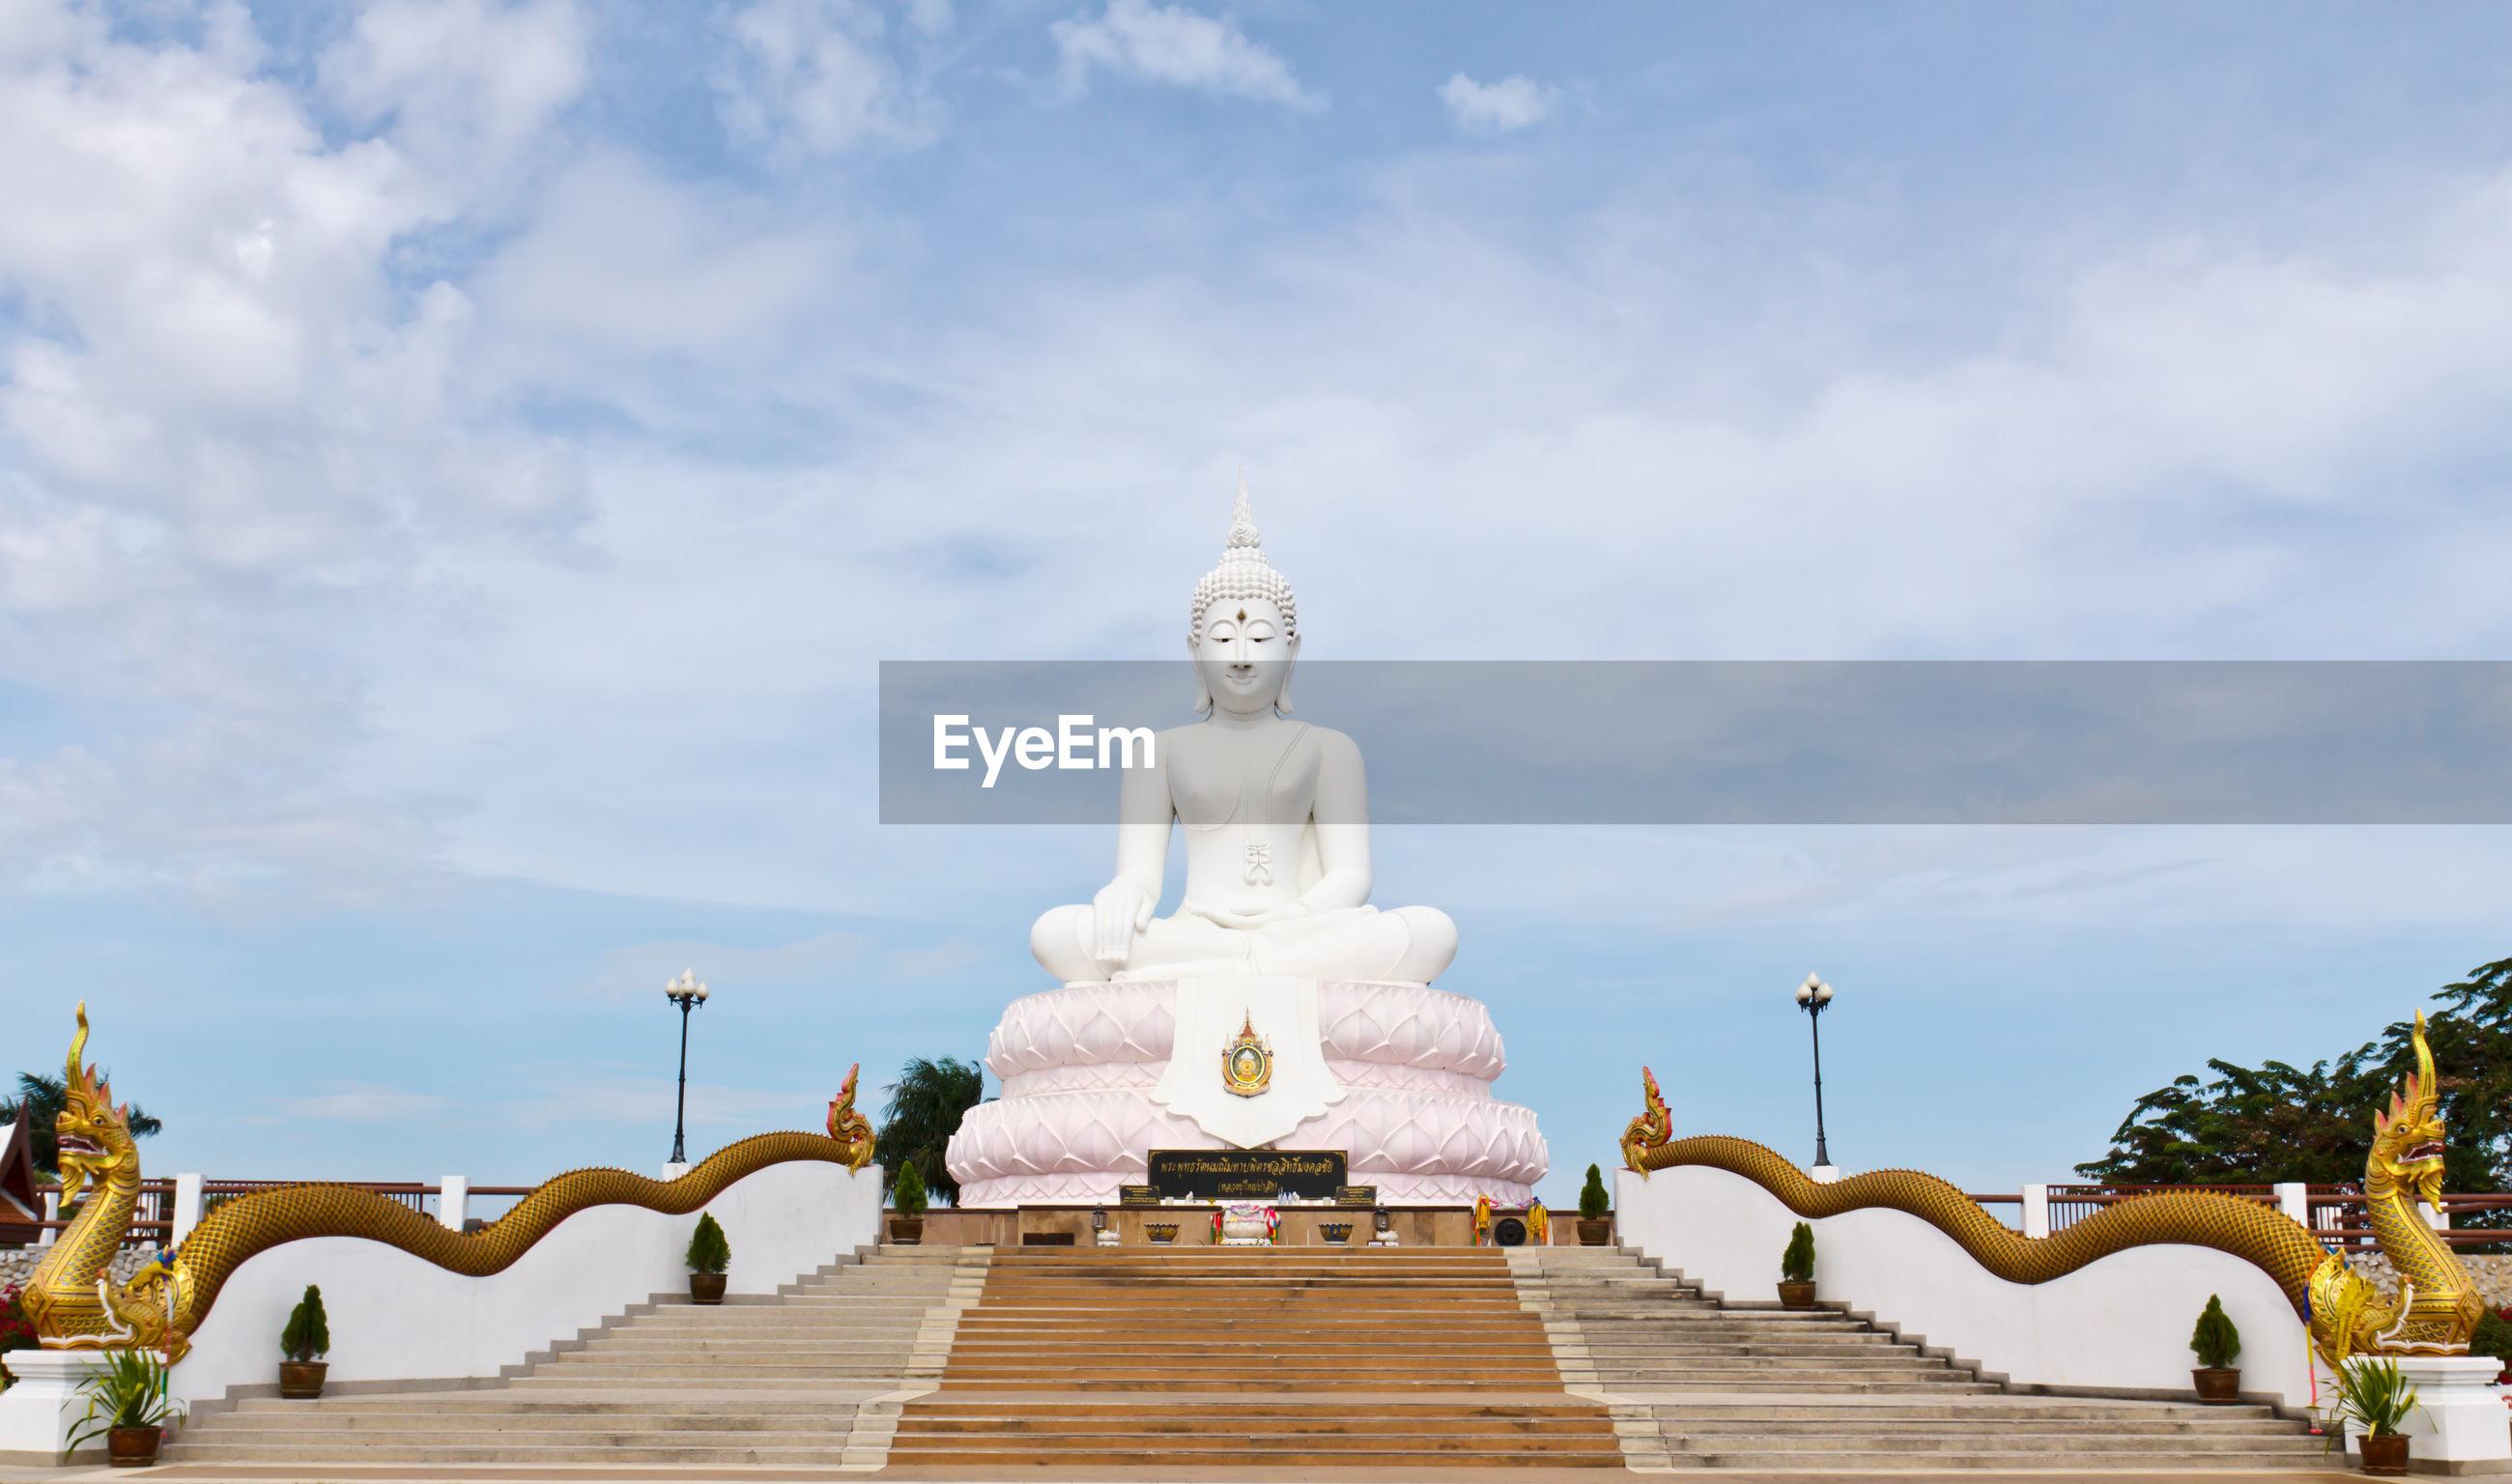 STATUE OF BUDDHA AGAINST SKY